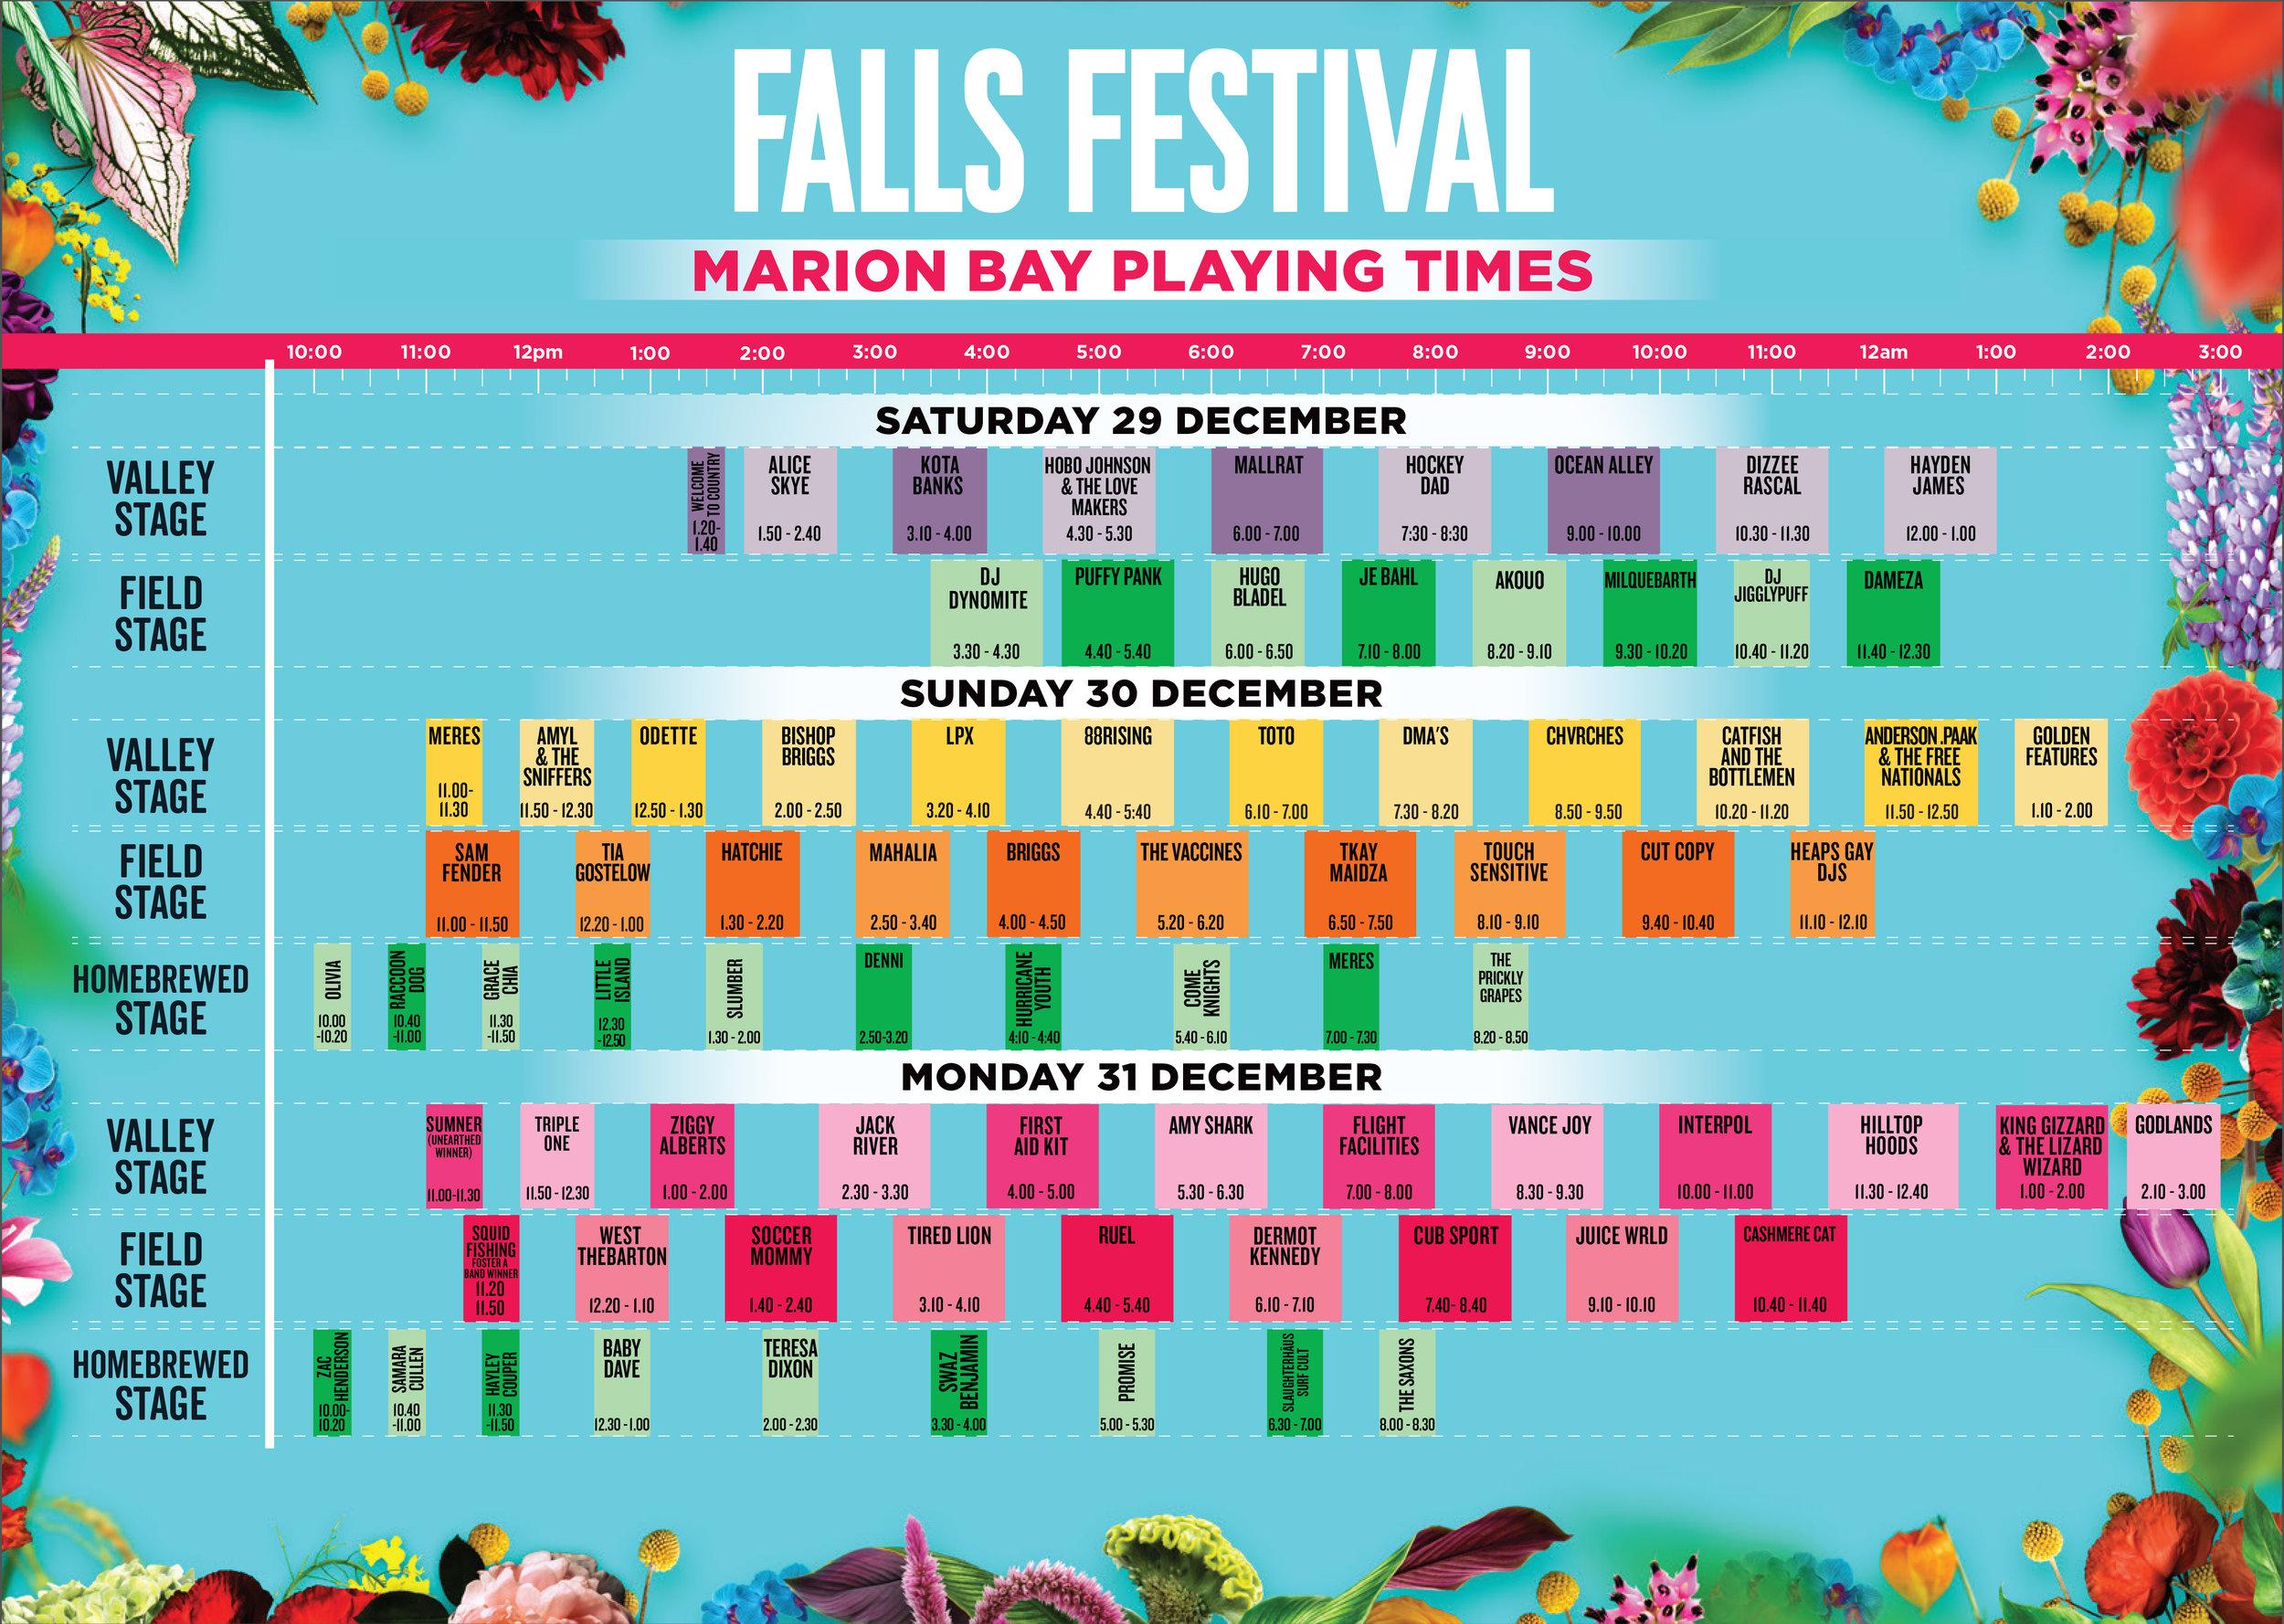 FALLS_2018_PlayingTimes_MarionBay_1712_03a.jpg